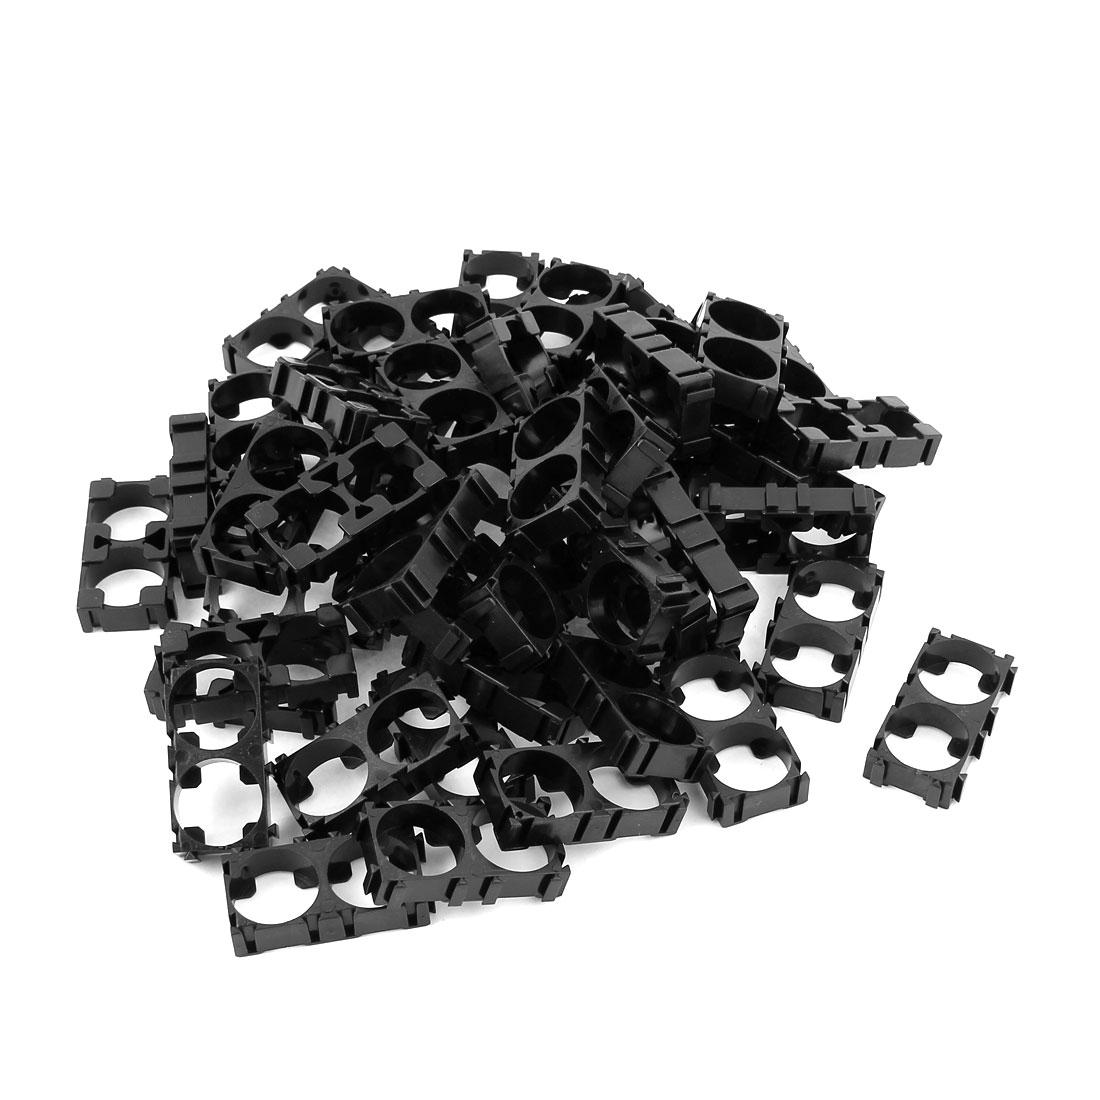 50 Pcs 18650 Lithium Cell Battery Double Holder Bracket for DIY Battery Pack